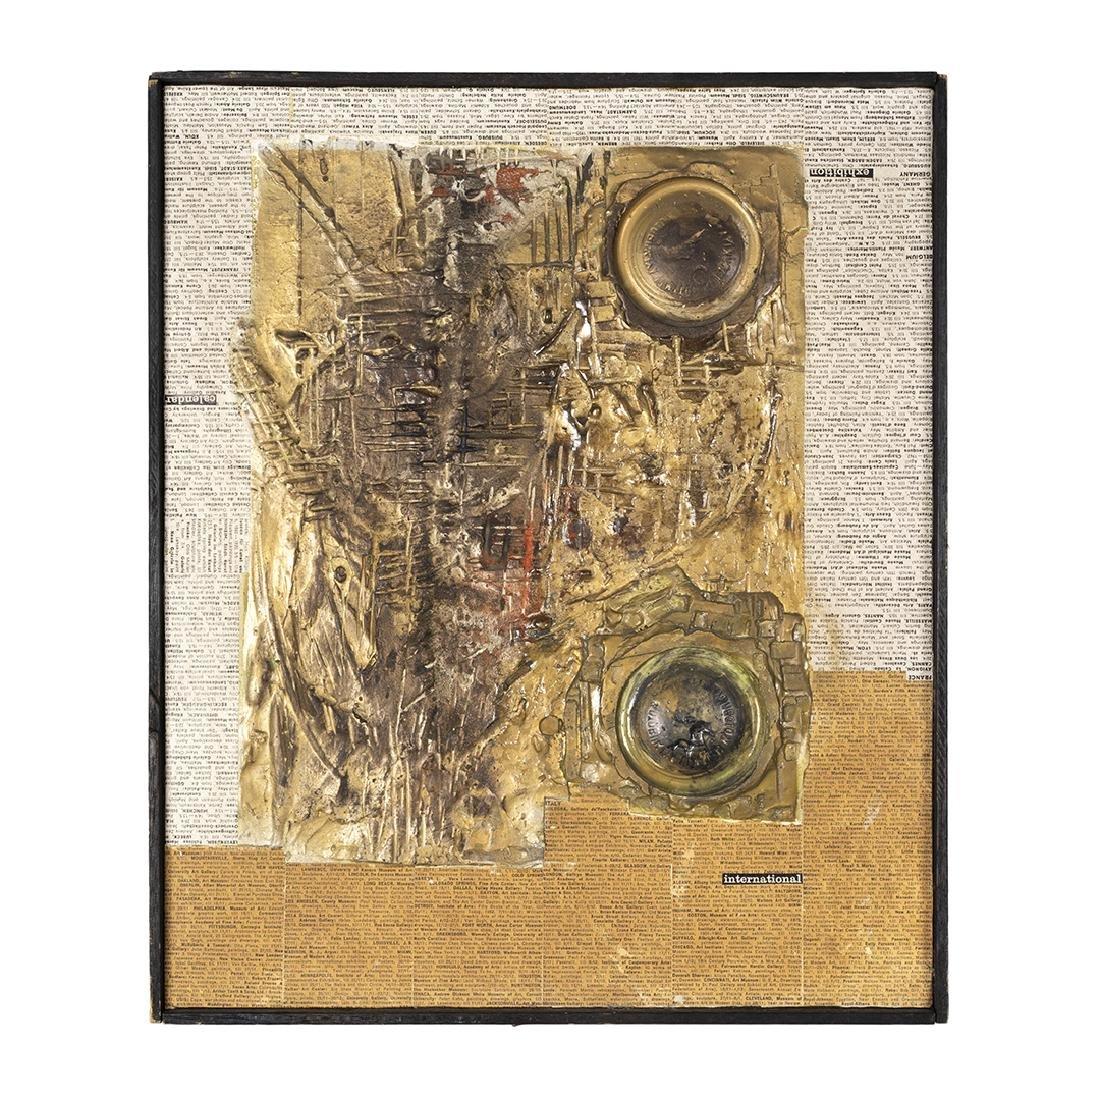 Taisuke Hamada Gold 64 Assemblage